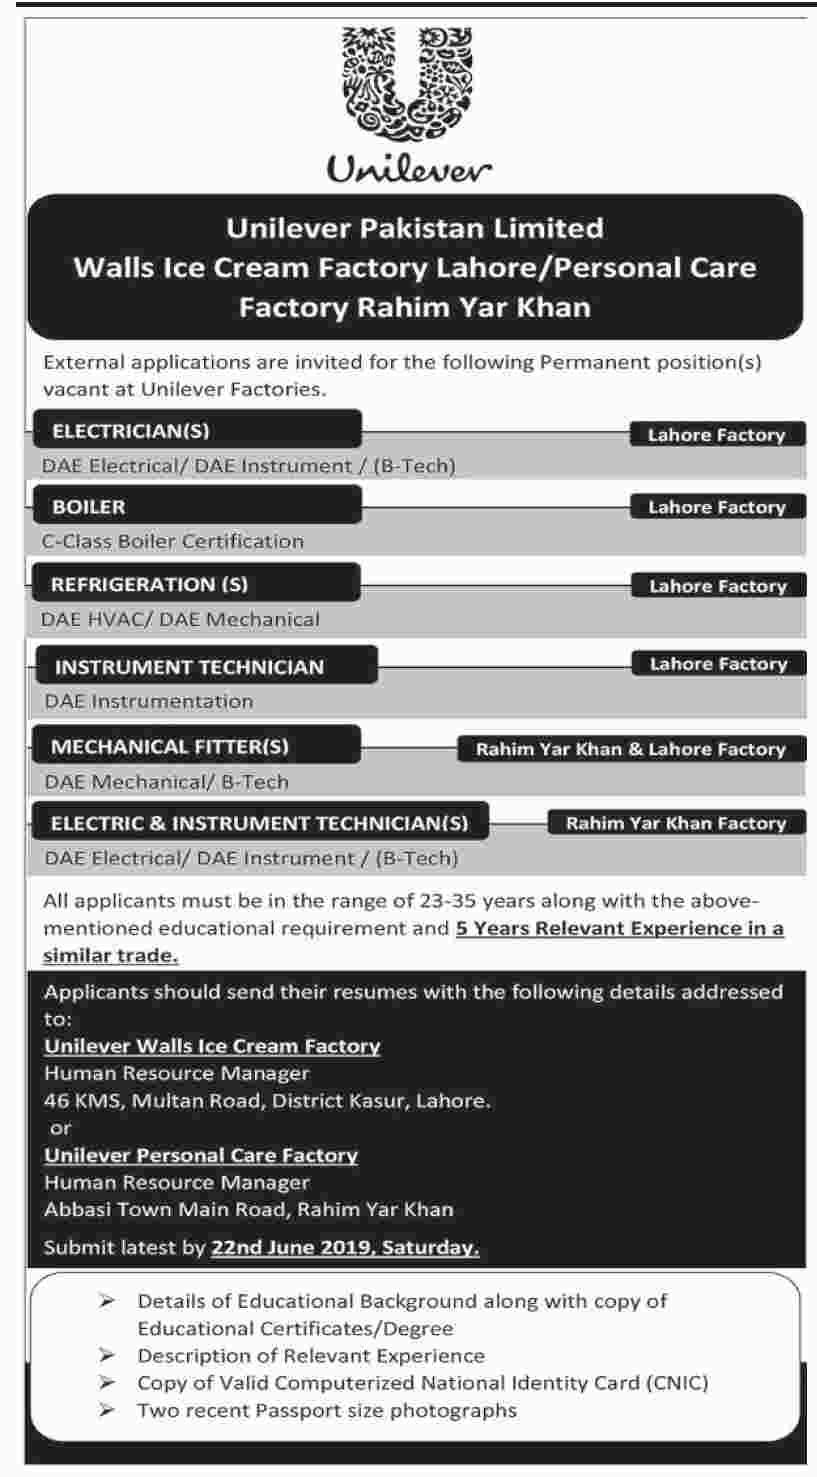 Advertisement for Unilever Pakistan Limited Jobs June 2019